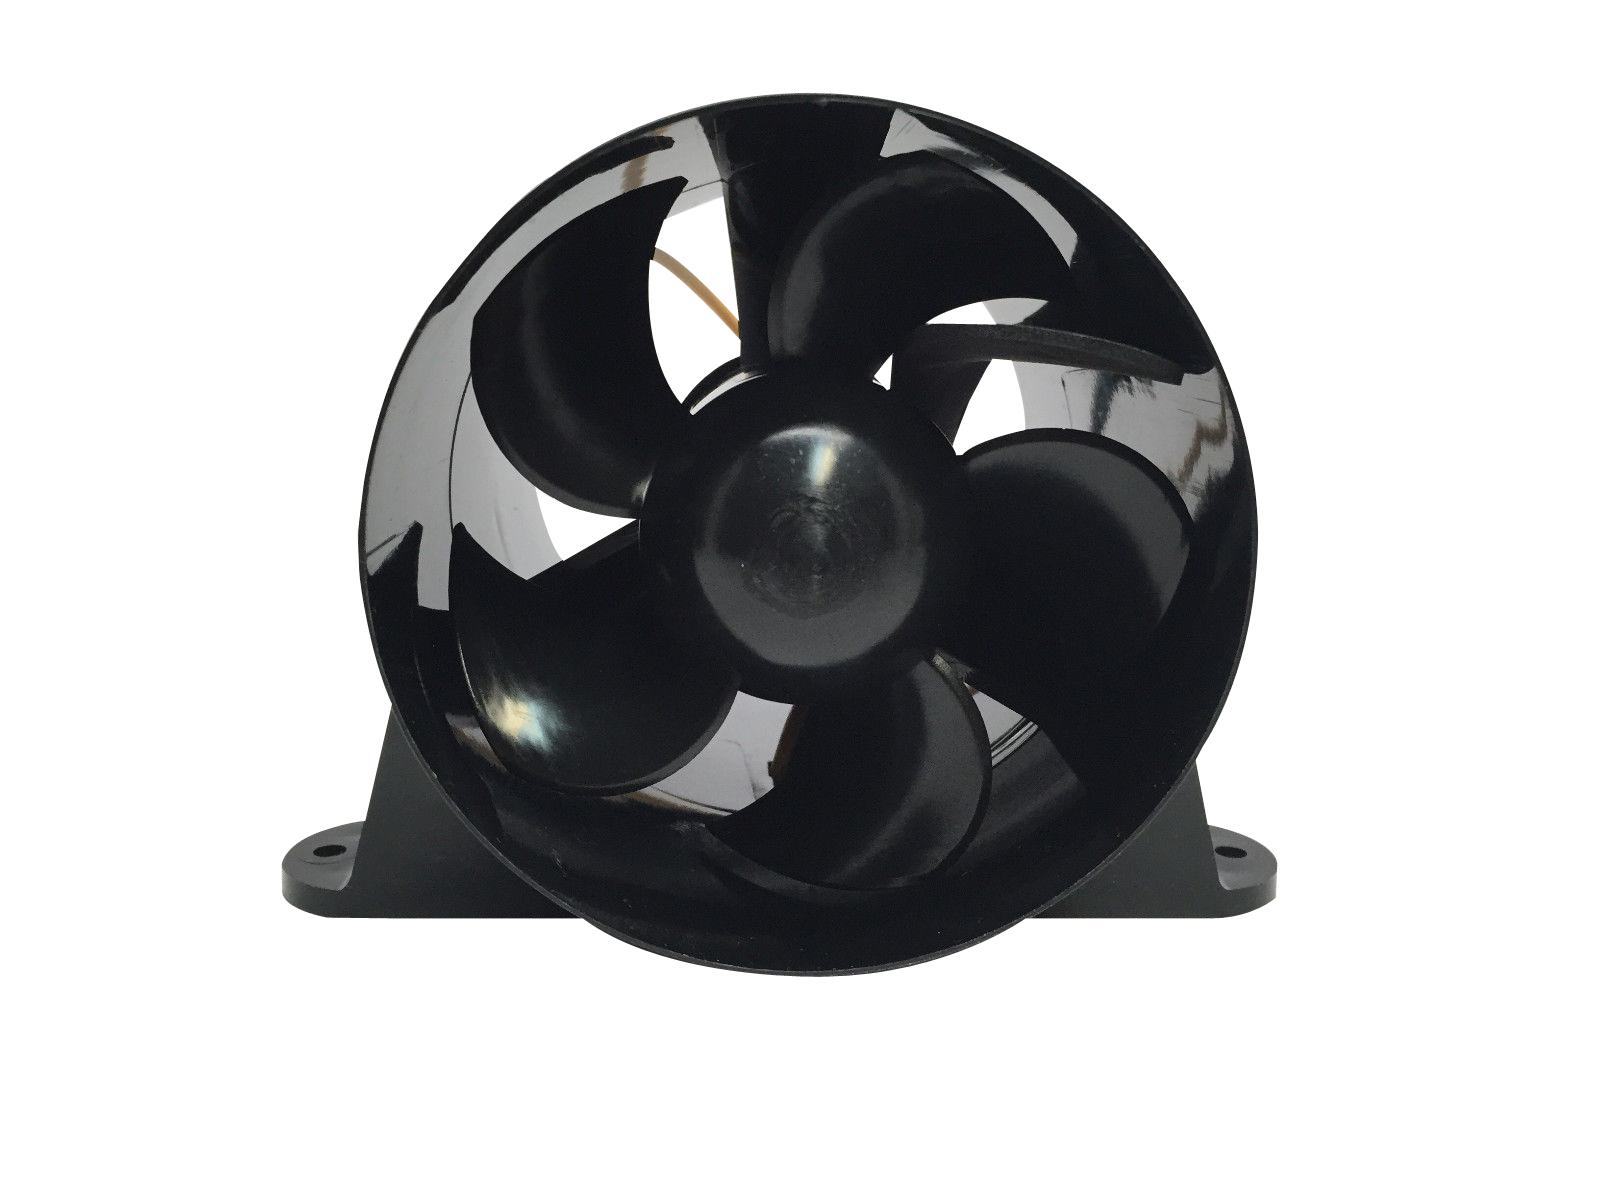 12V Black Pactrade Marine High Performance Turbo in Line Bilge Blower